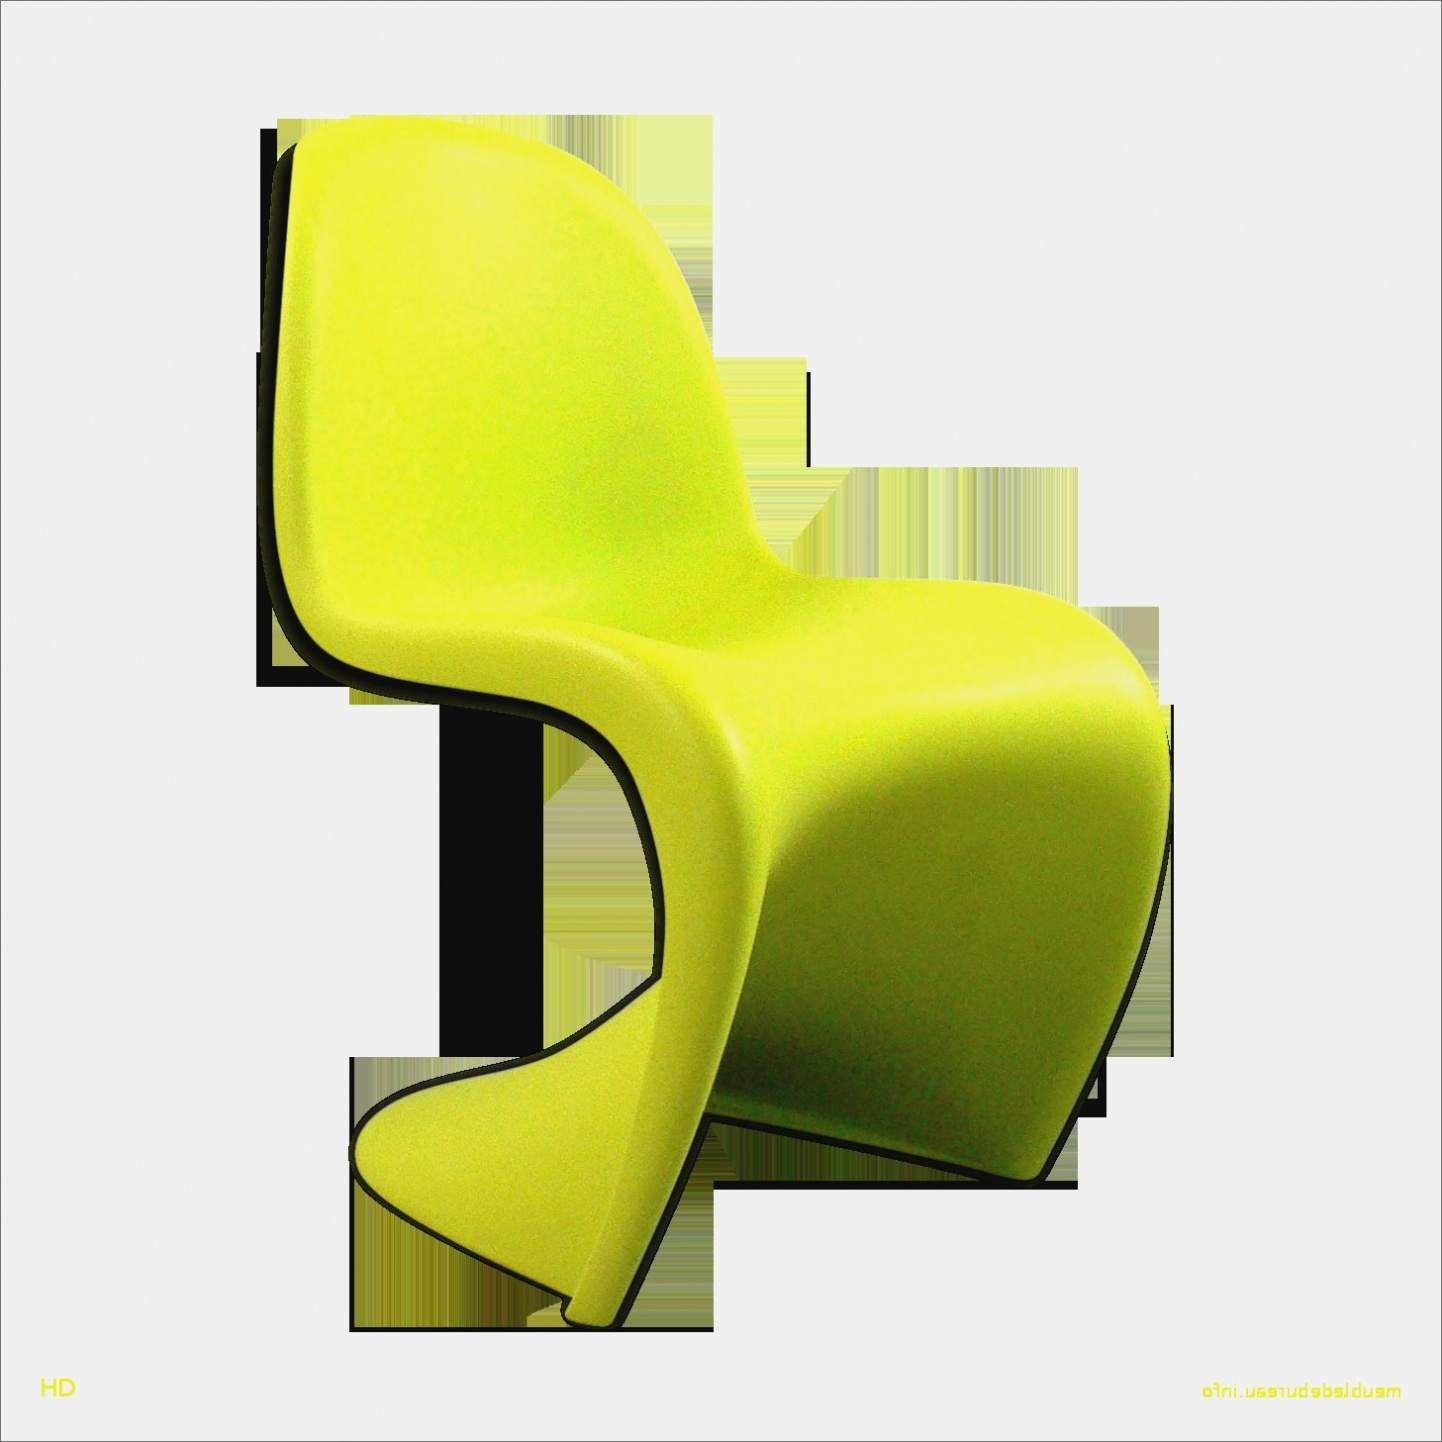 leroy merlin table pliante jardin ainsi que chaise fushia nouveau chaise de bureau junior beau chaise tulipe 0d de leroy merlin table pliante jardin